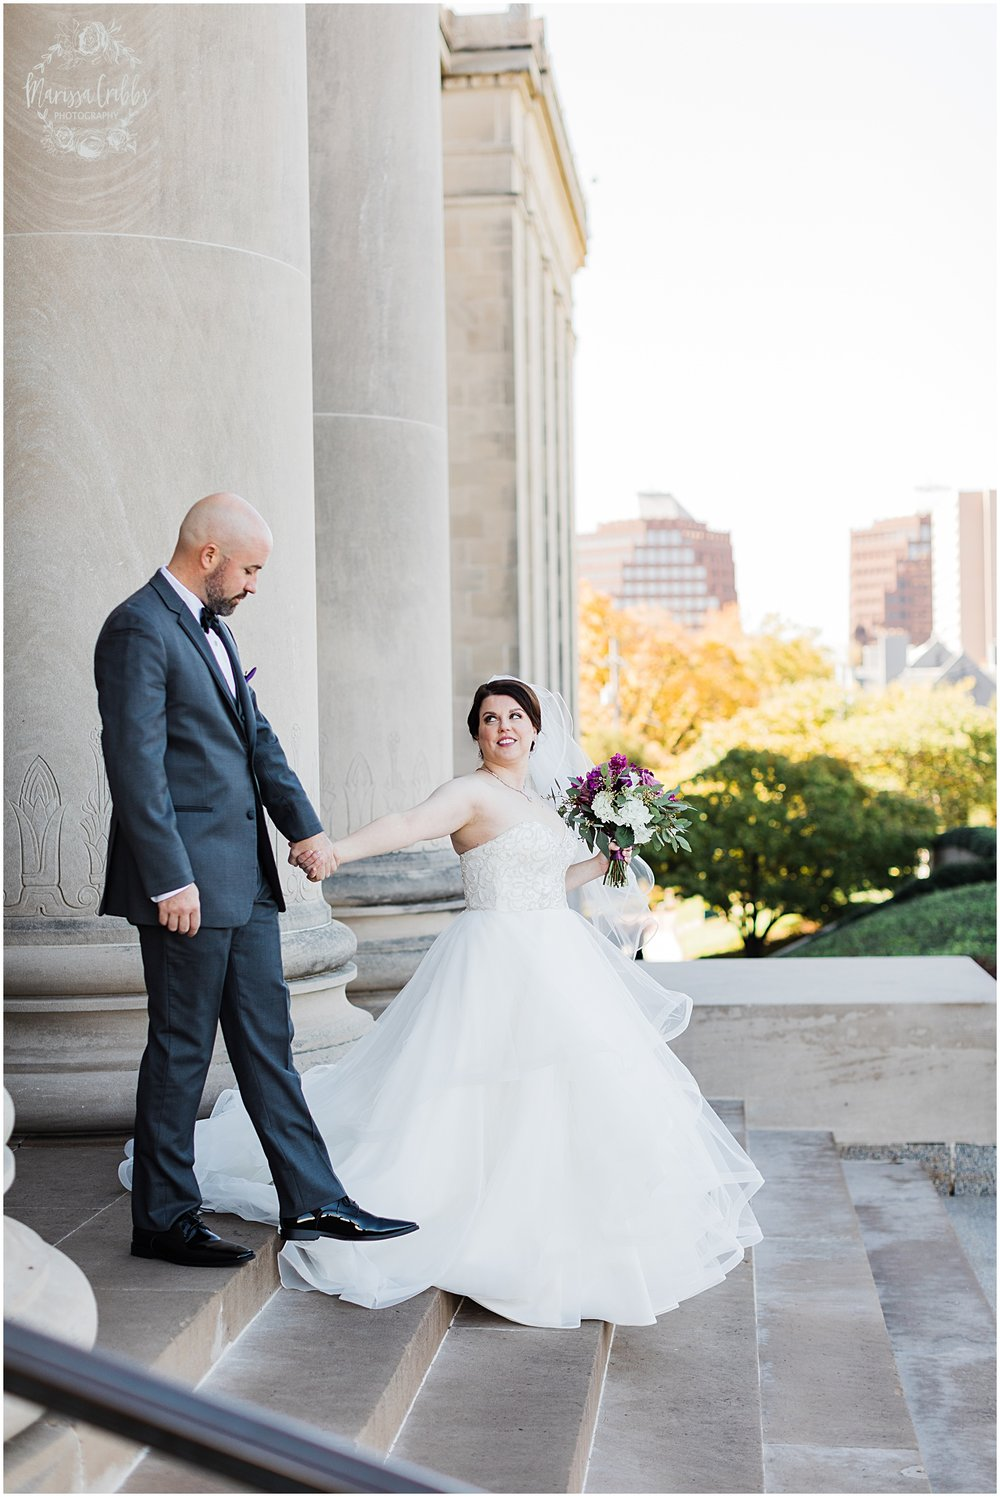 LAURA & DAN MARRIED   NELSON ATKINS MUSEUM   MARISSA CRIBBS PHOTOGRAPHY_7002.jpg